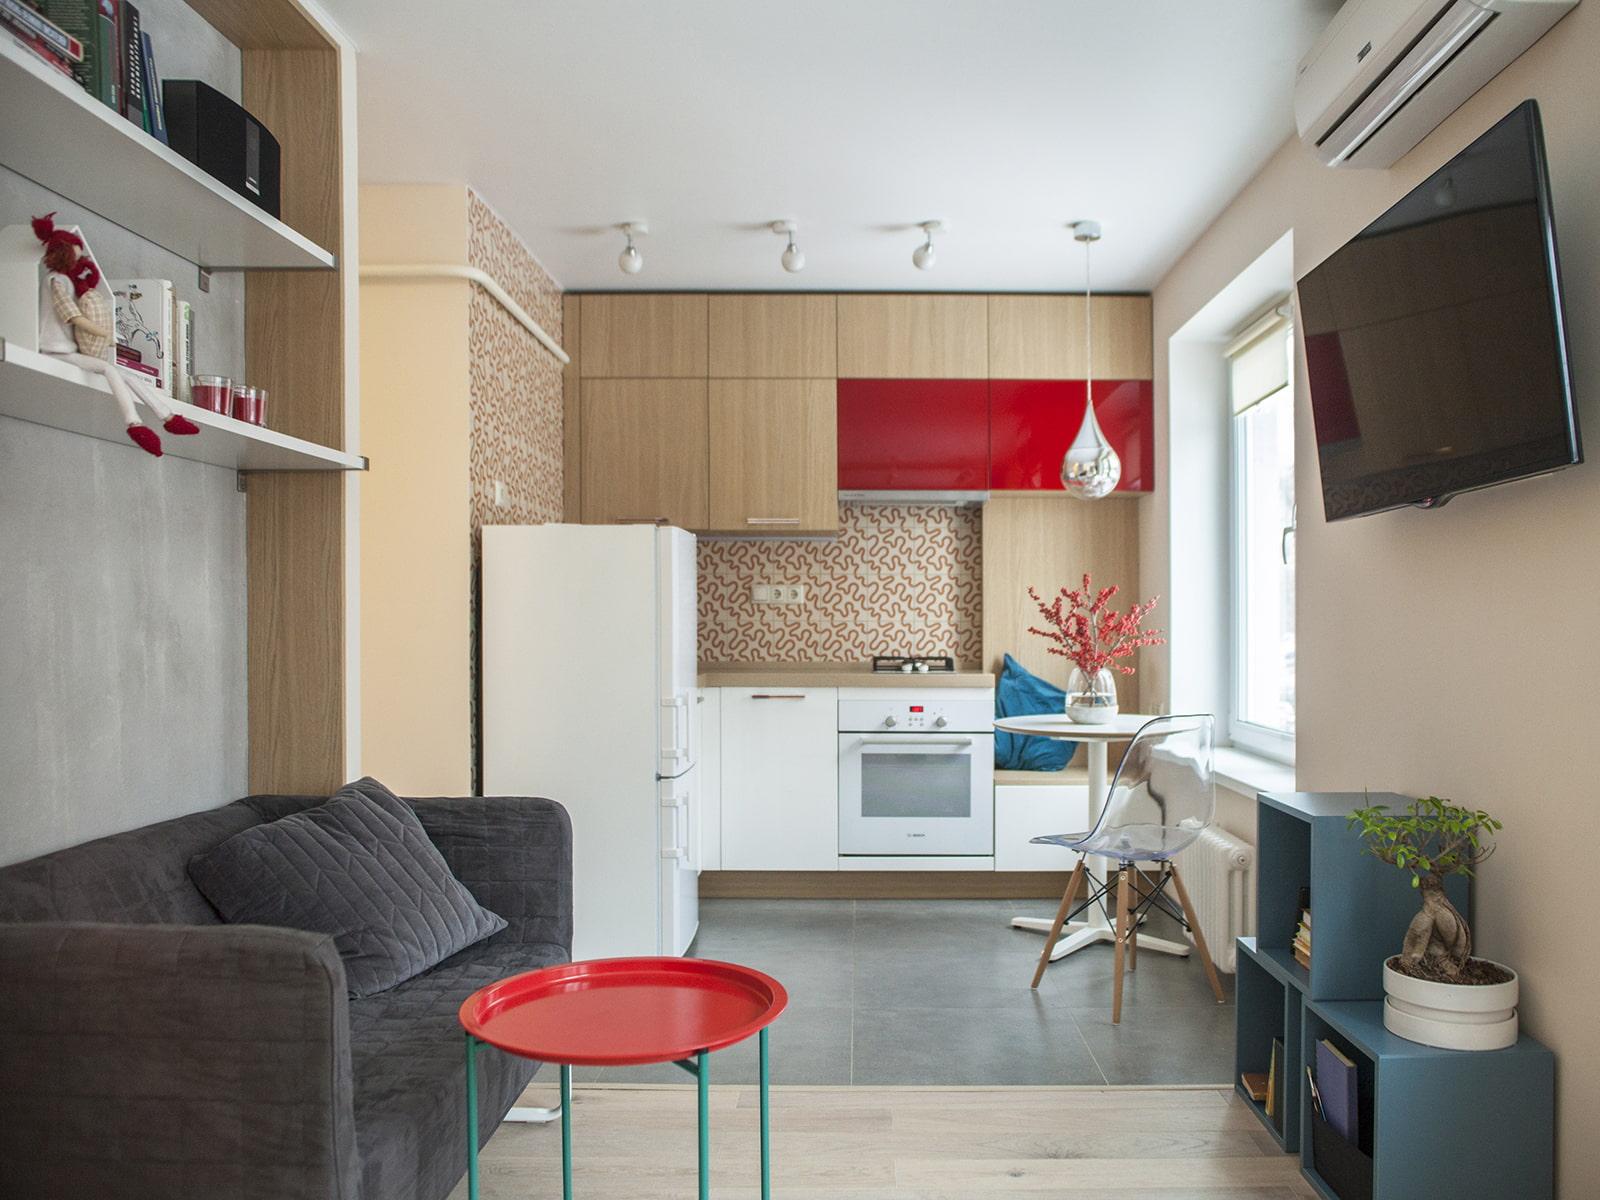 кухня 15 кв м с диваном фото